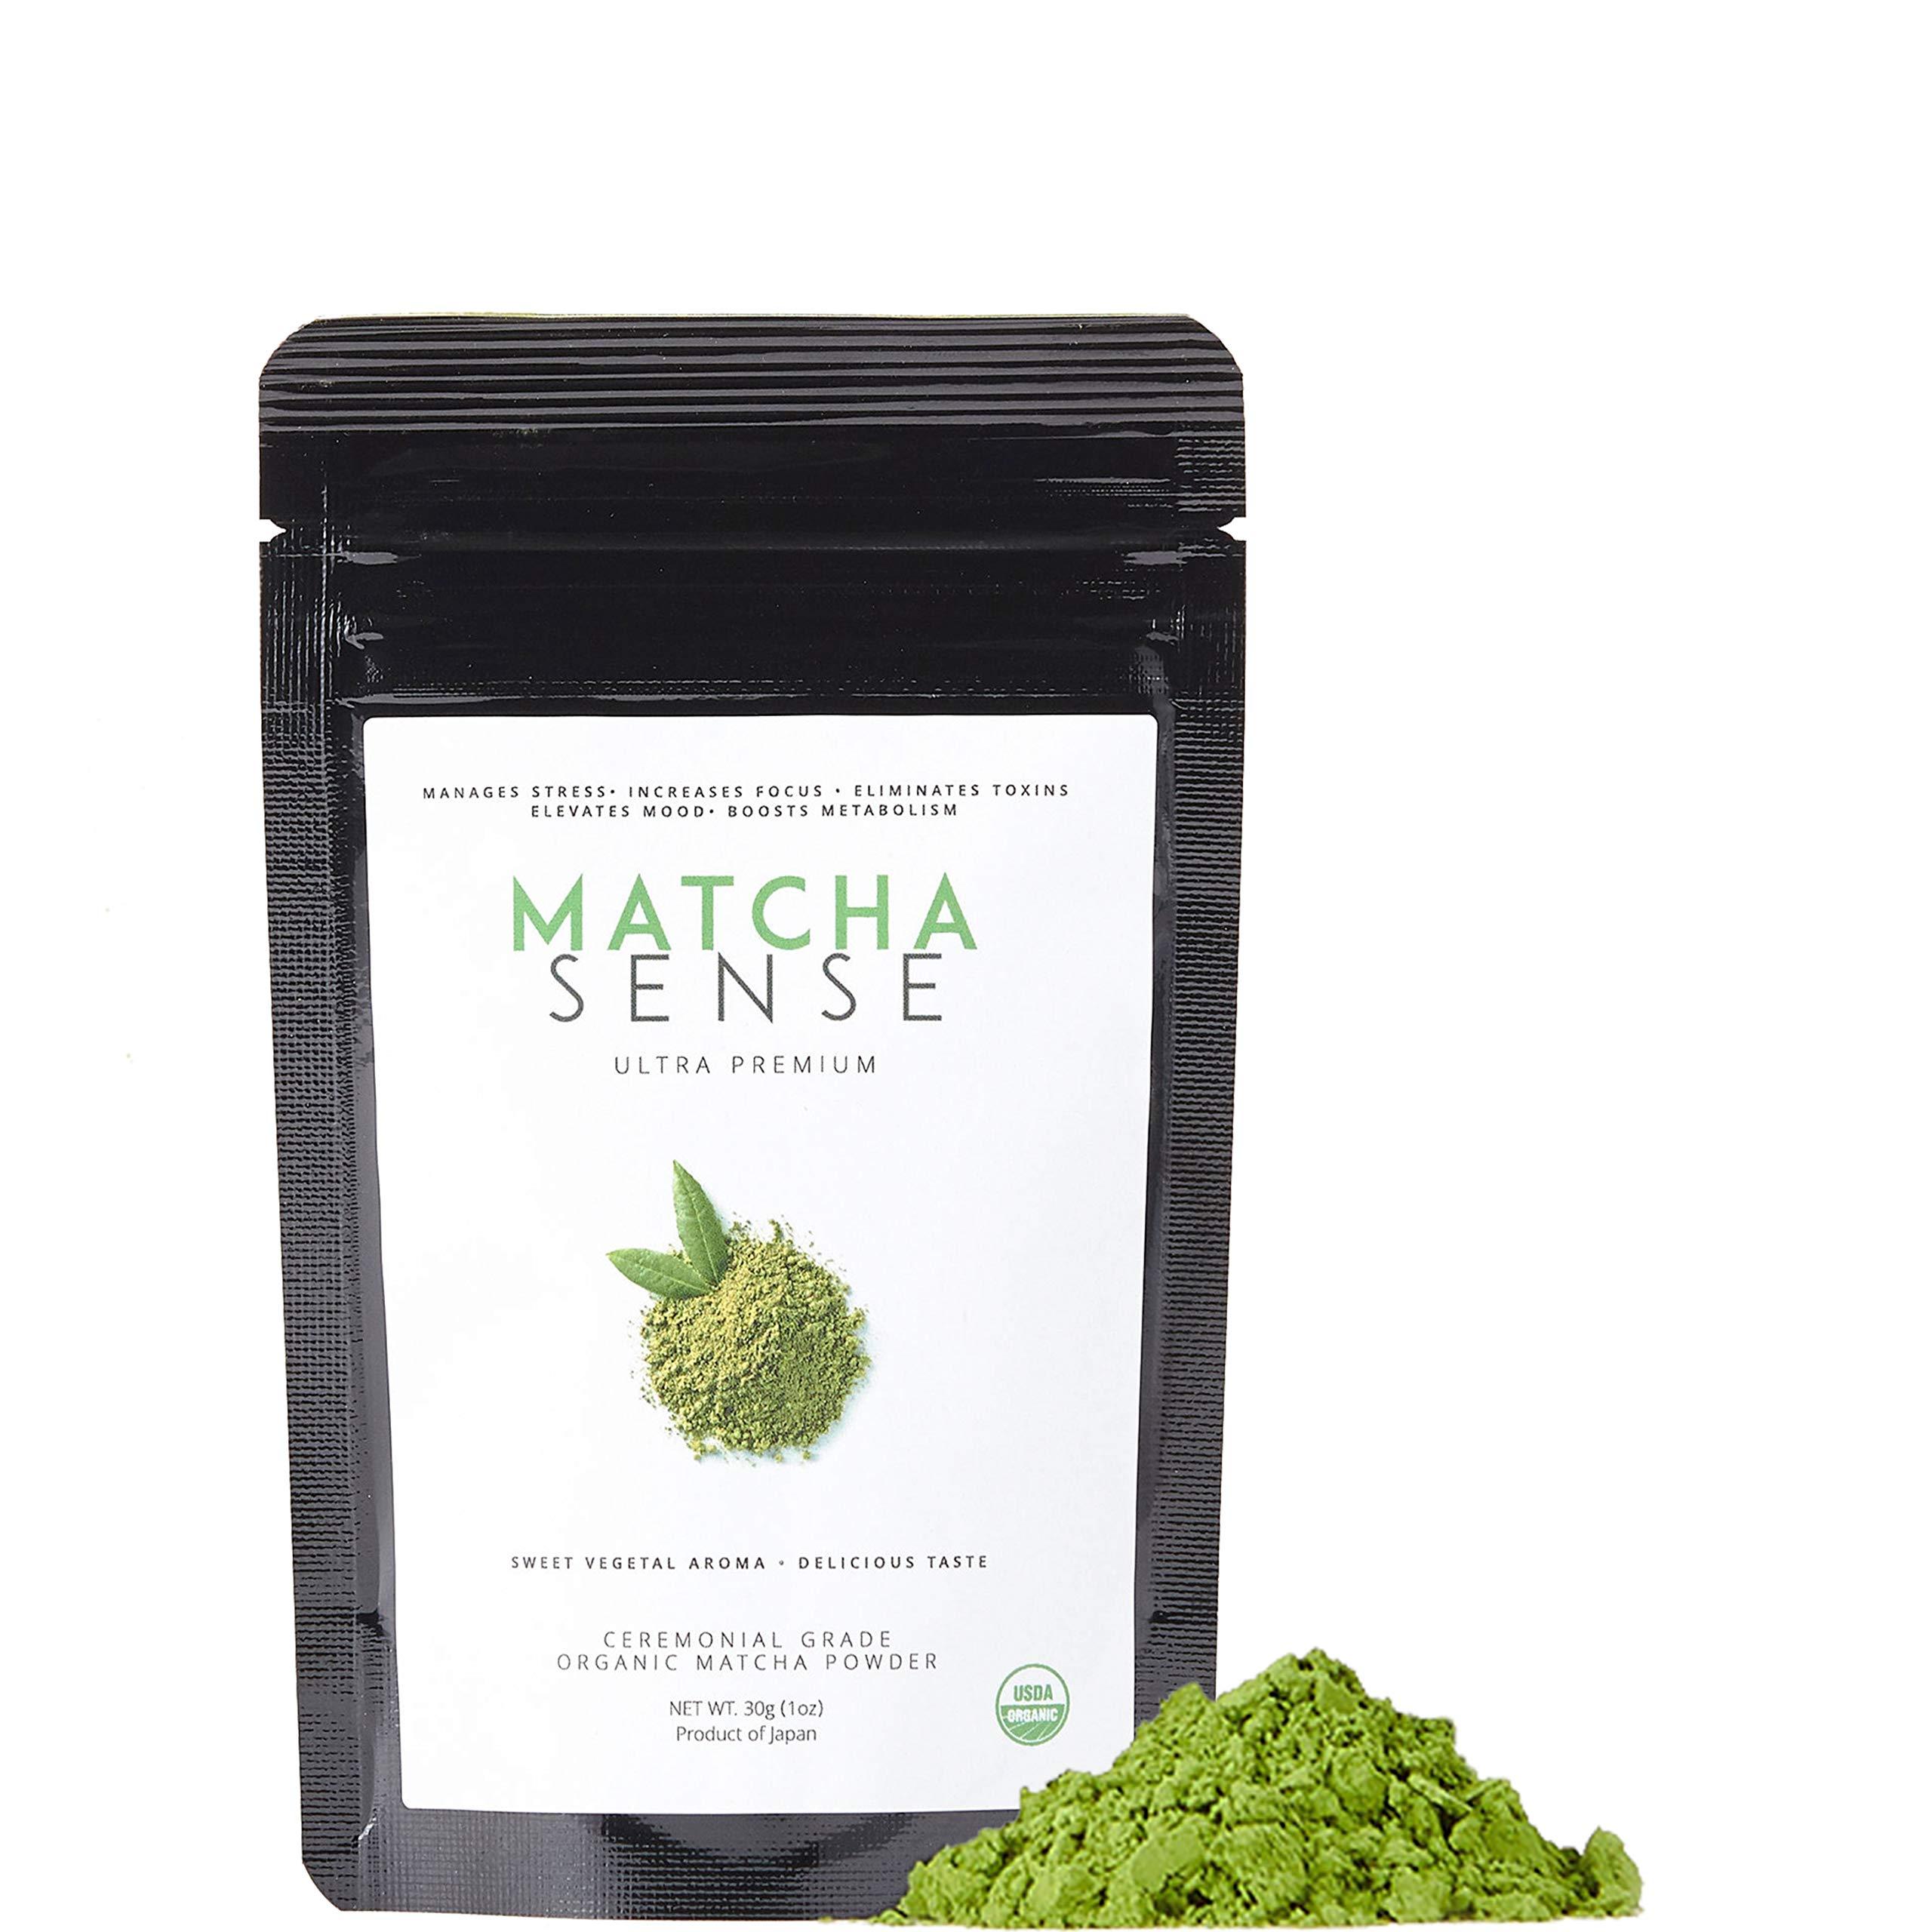 Matcha Sense - Premium Ceremonial Grade Matcha Green Tea Powder - Authentic Japanese Origin USDA and JAS Certified Organic - 30g Standard Size